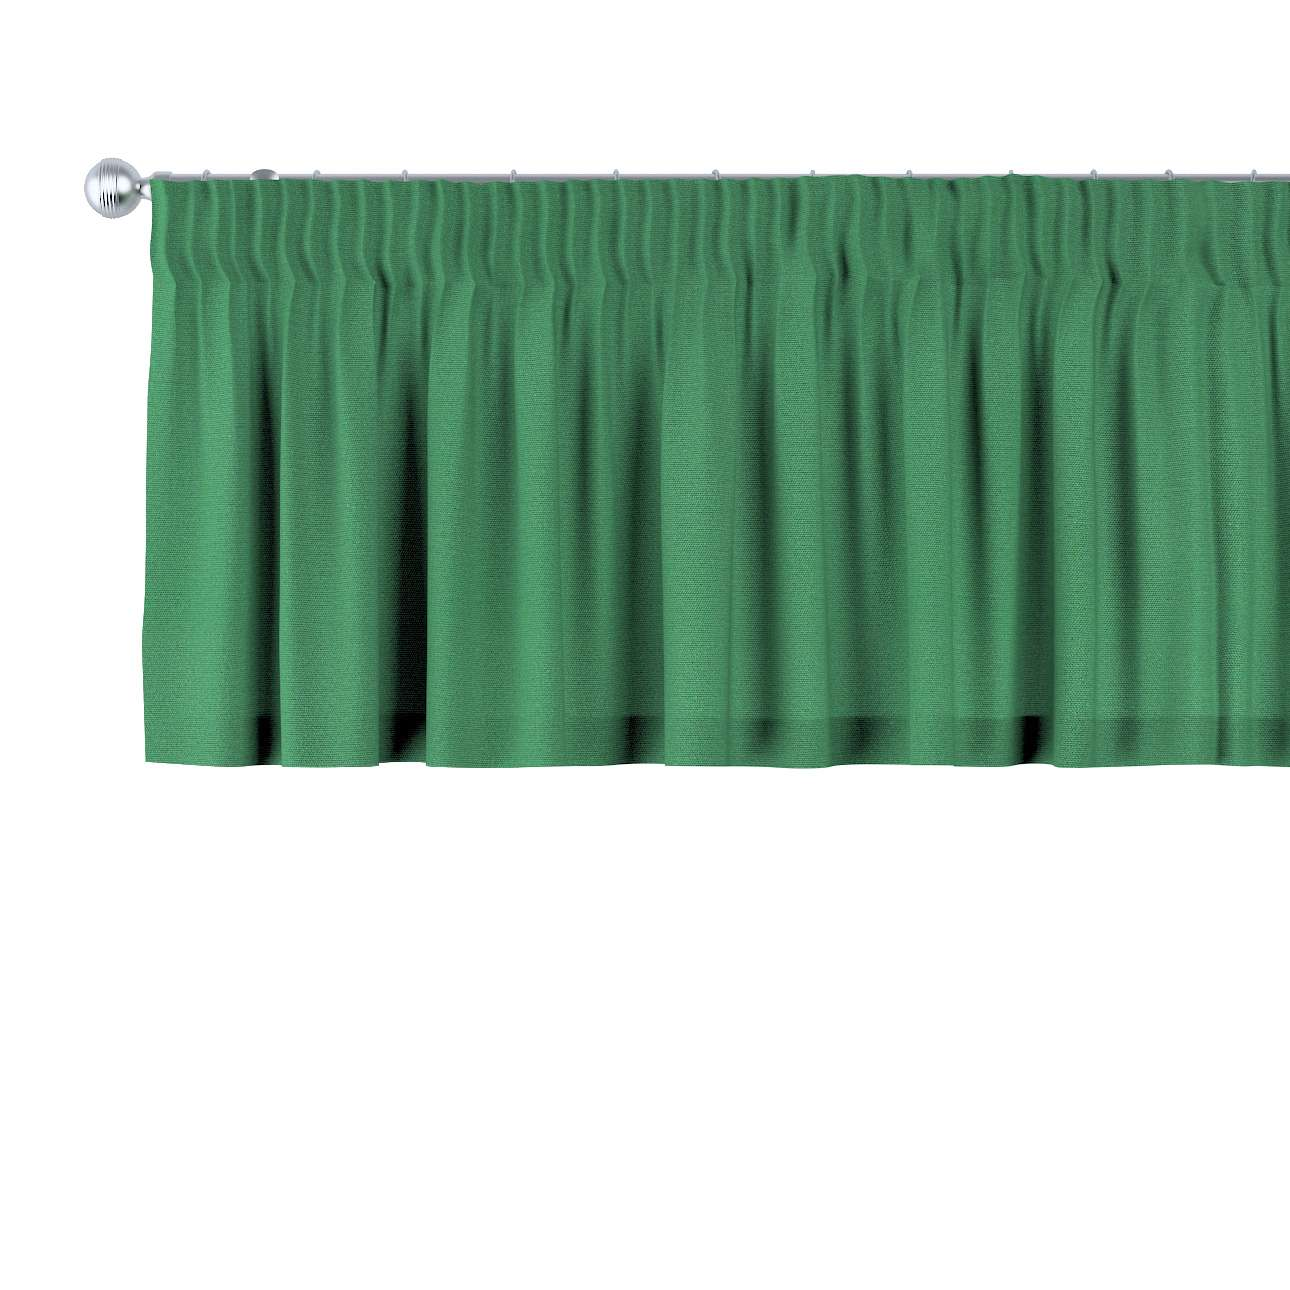 Kurzgardine mit Kräuselband von der Kollektion Loneta, Stoff: 133-18